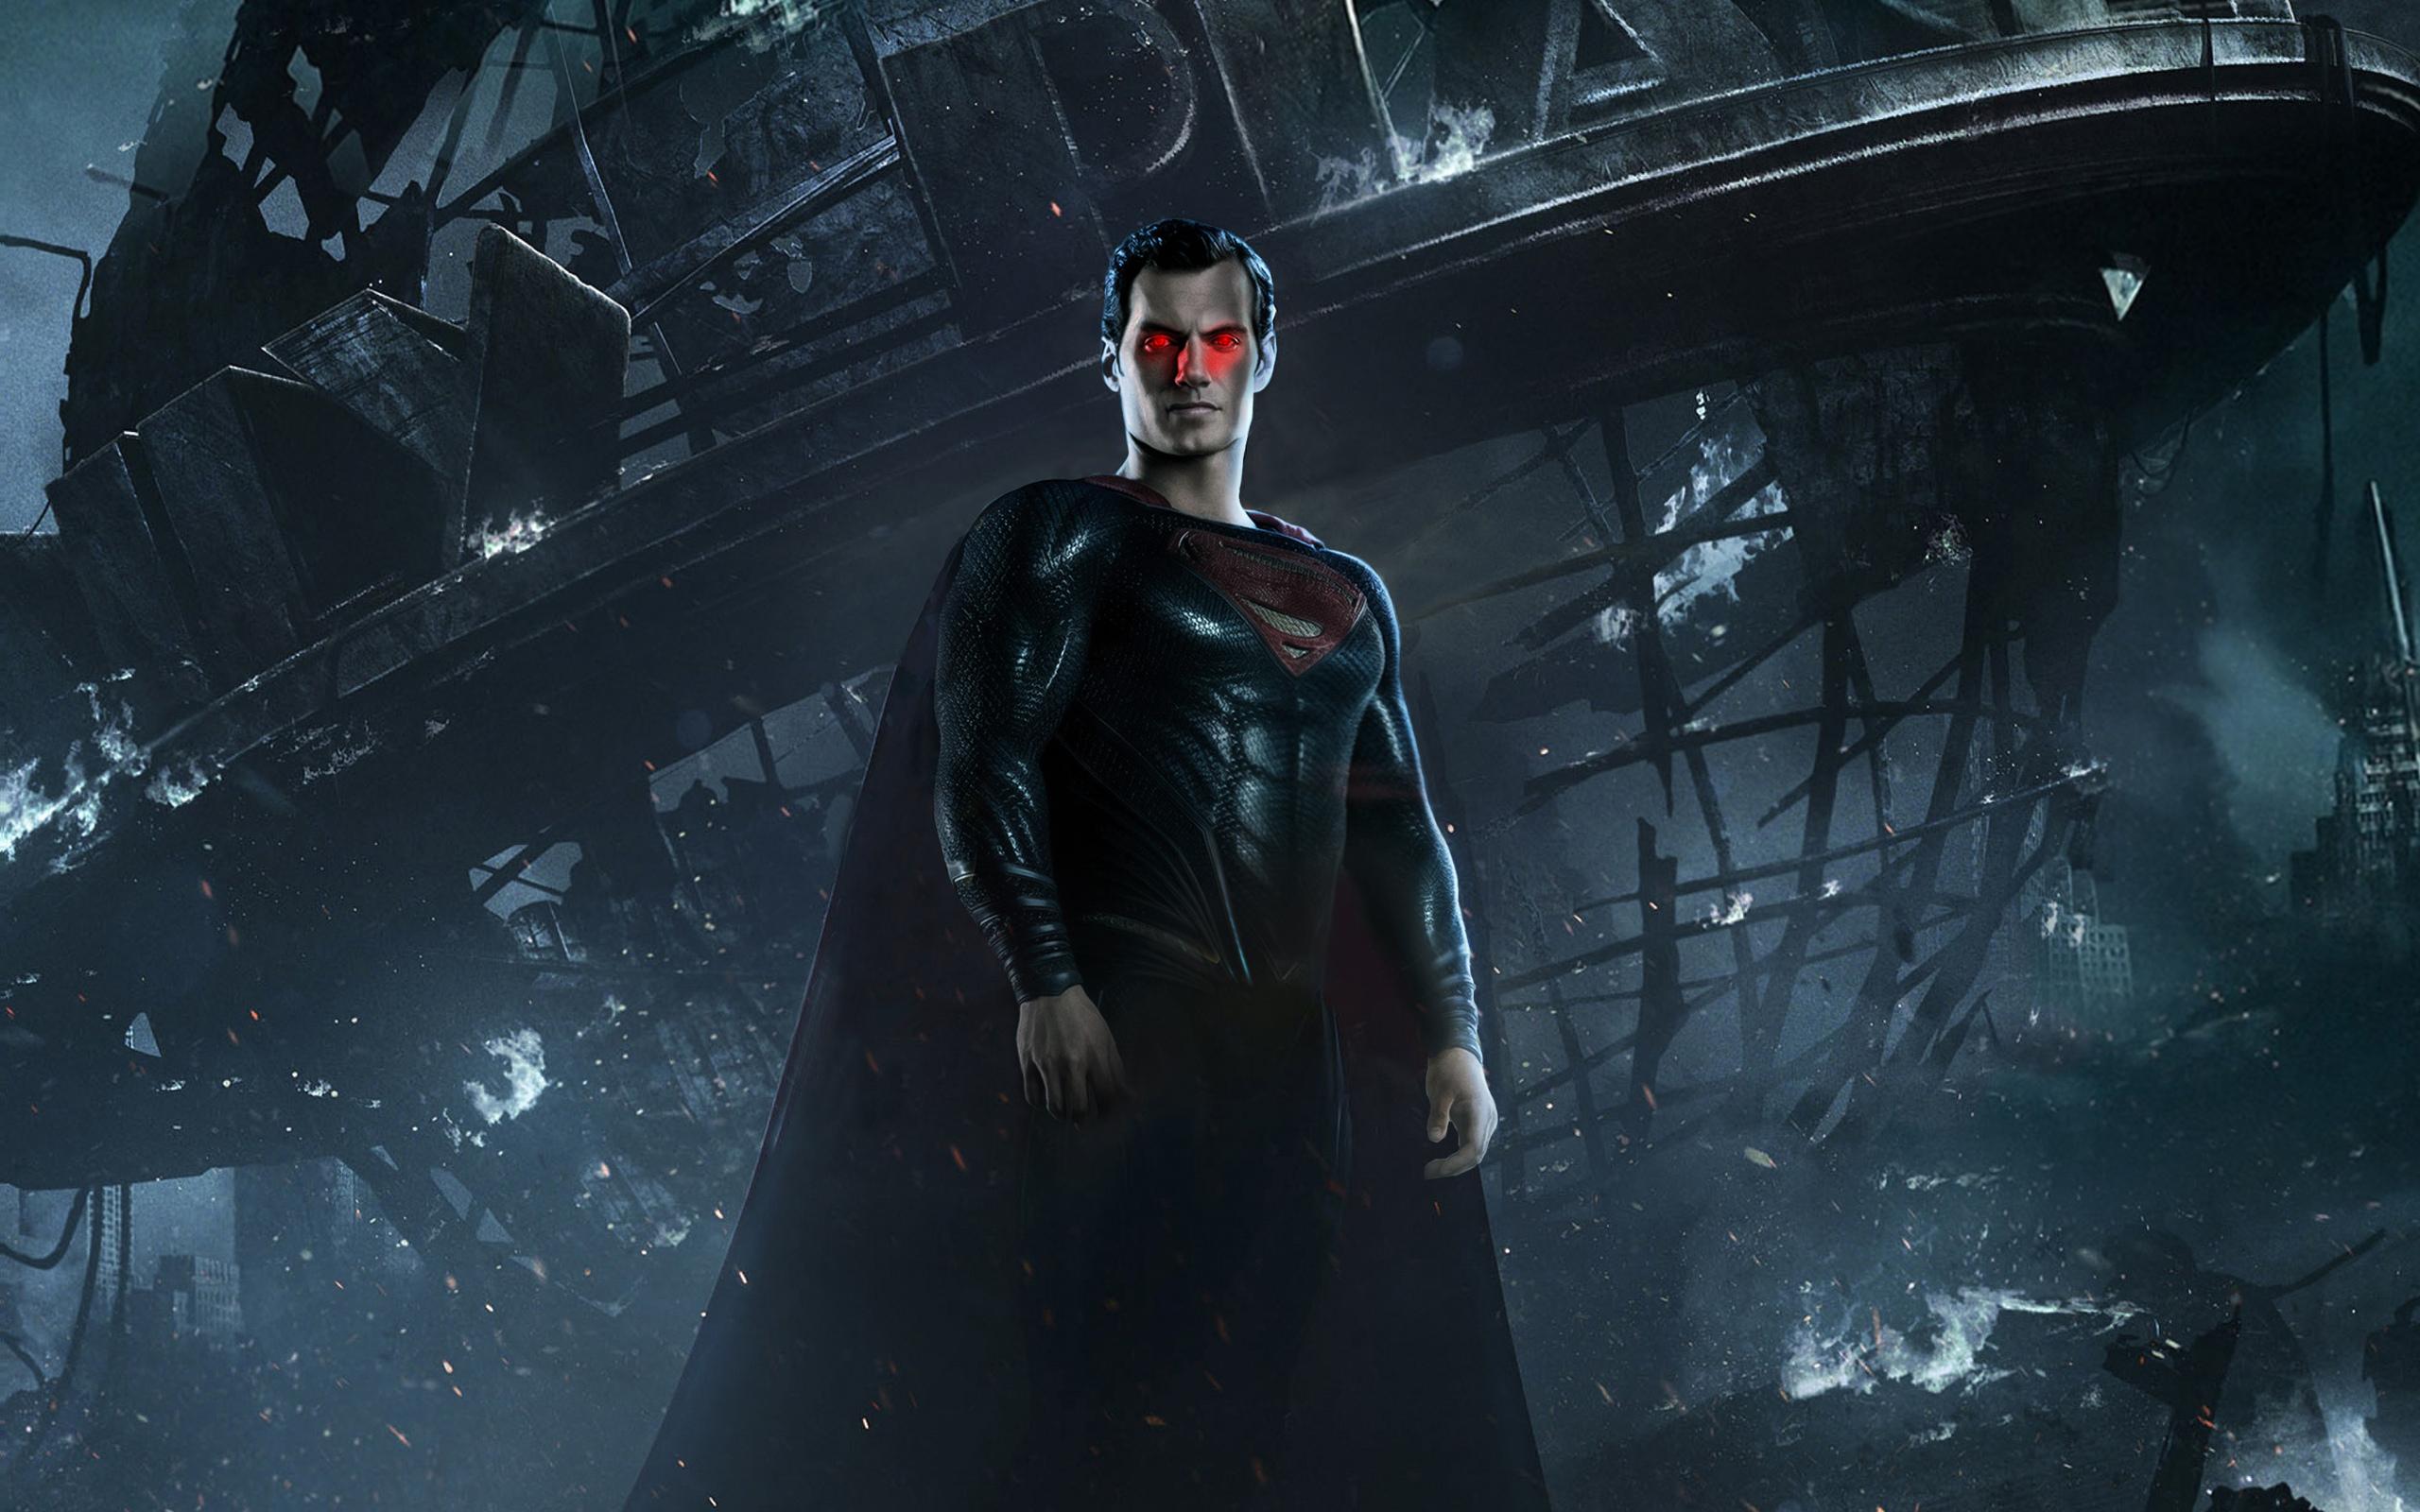 injustice-2-superman-image.jpg